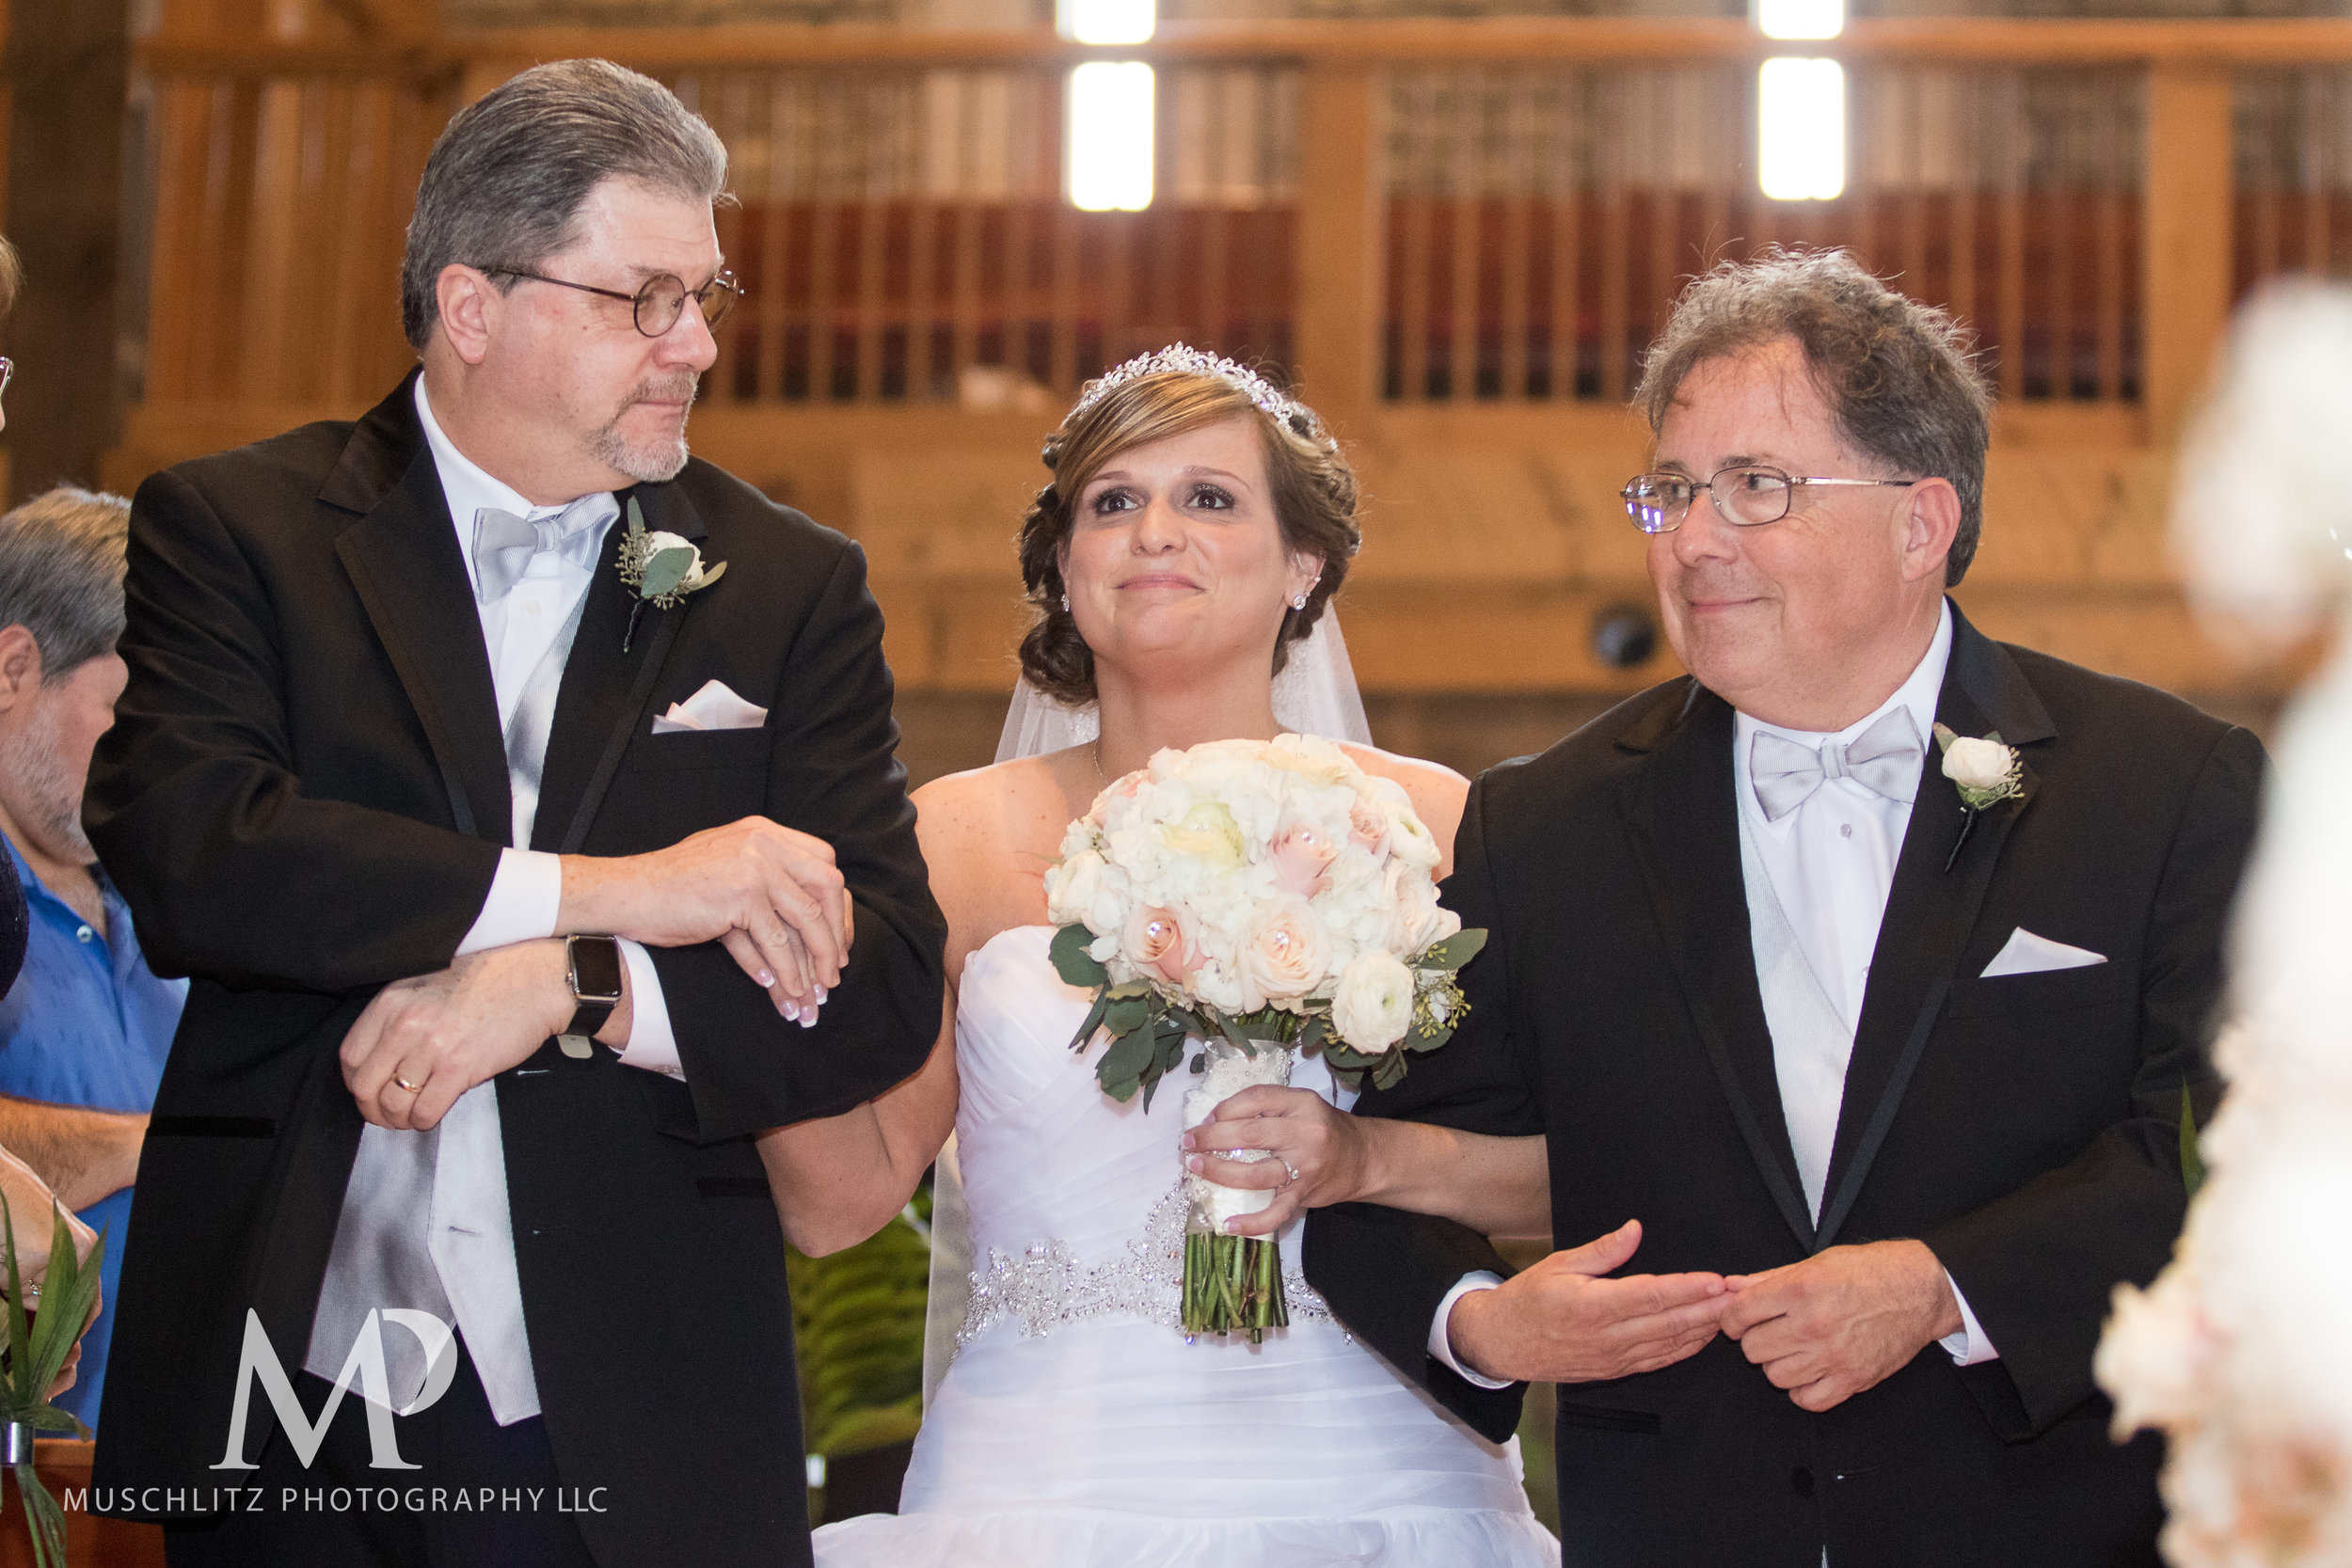 liberty-barn-presbyterian-church-wedding-delaware-columbus-ohio-muschlitz-photography-029.JPG